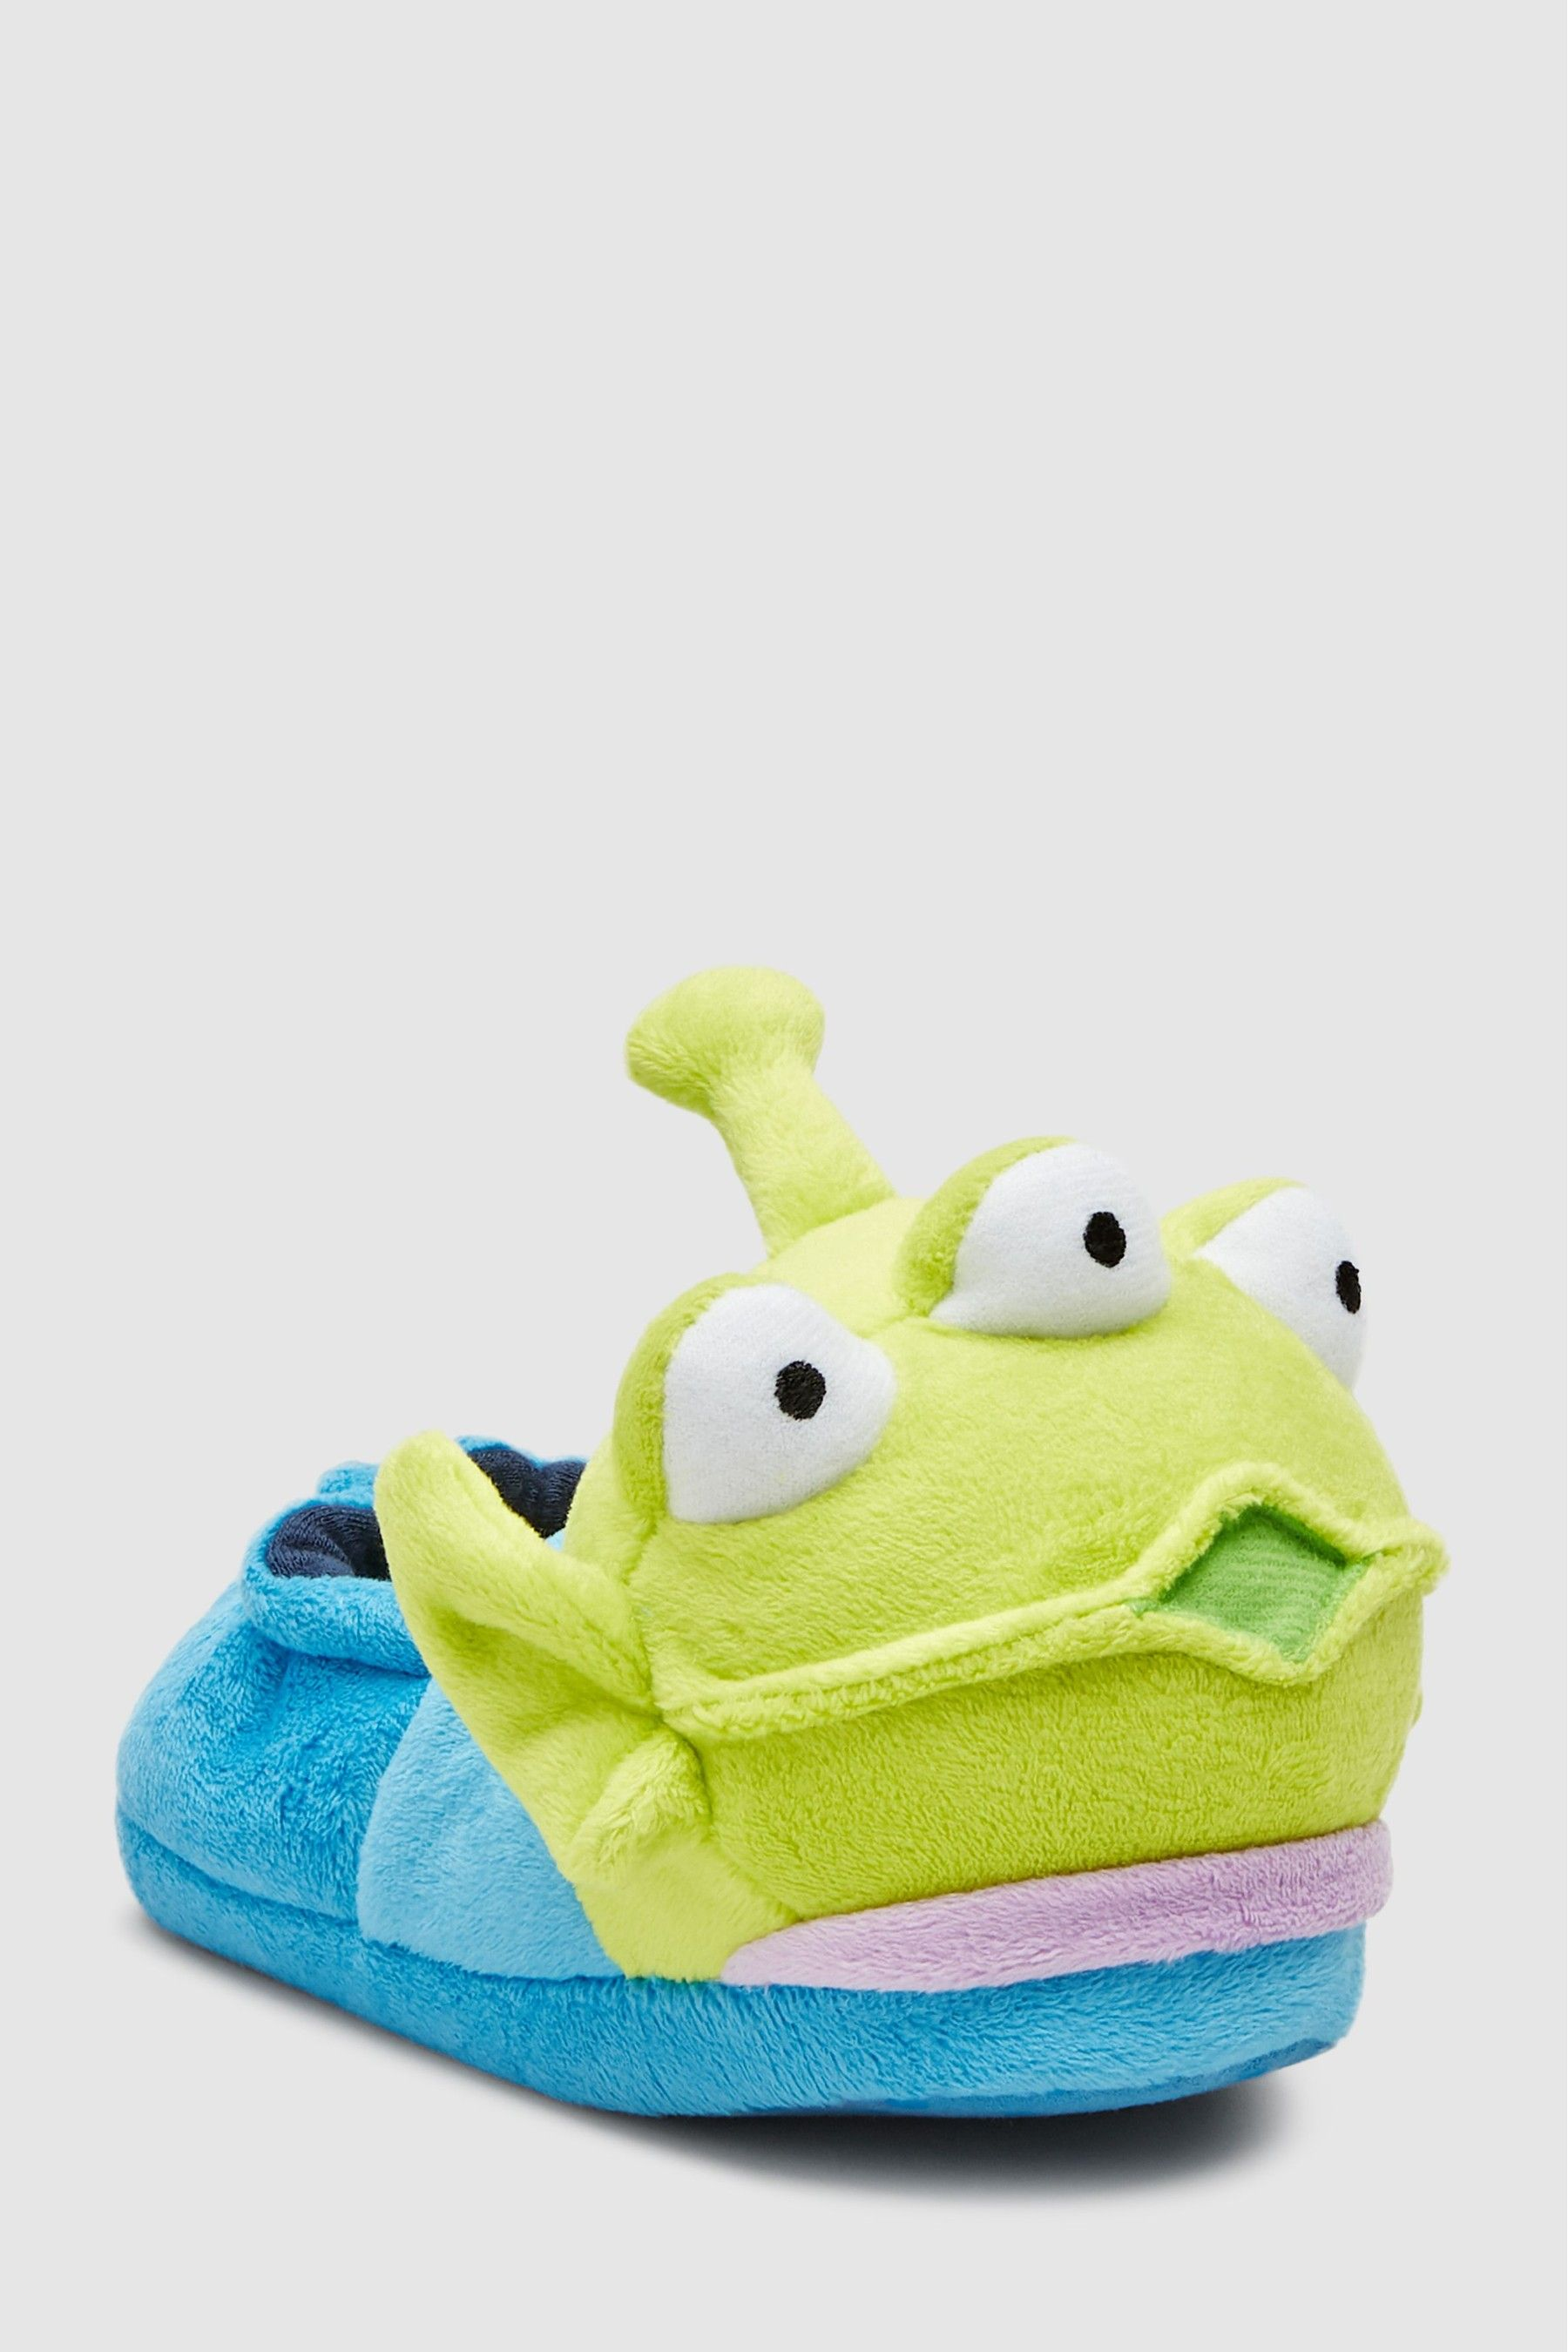 Boys Green Disney Toy Story Alien